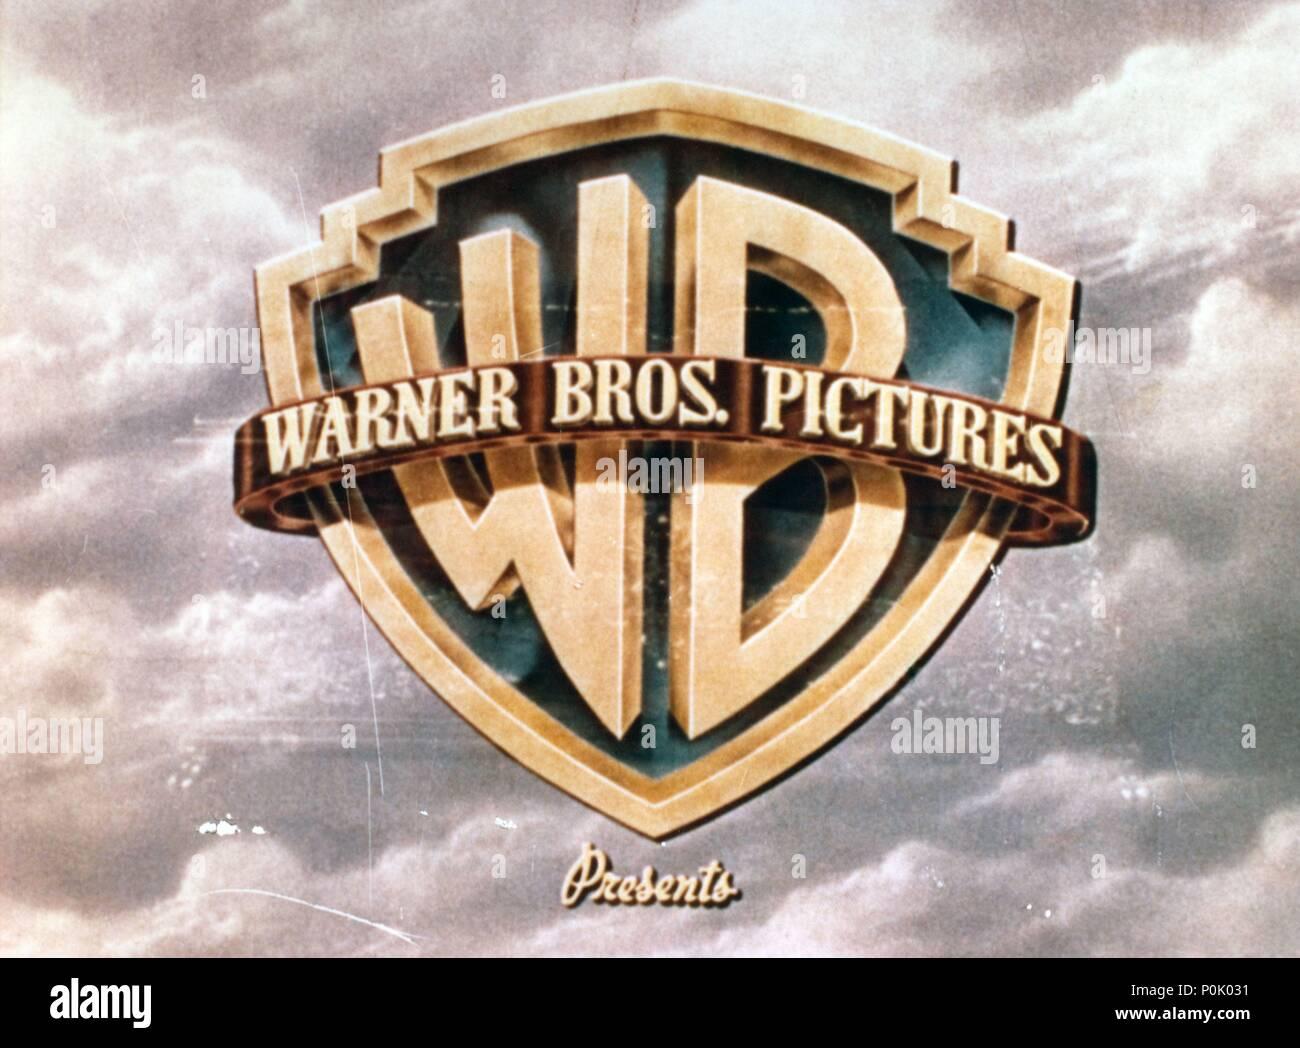 Description Logo Of The Warner Bros Pictures Production